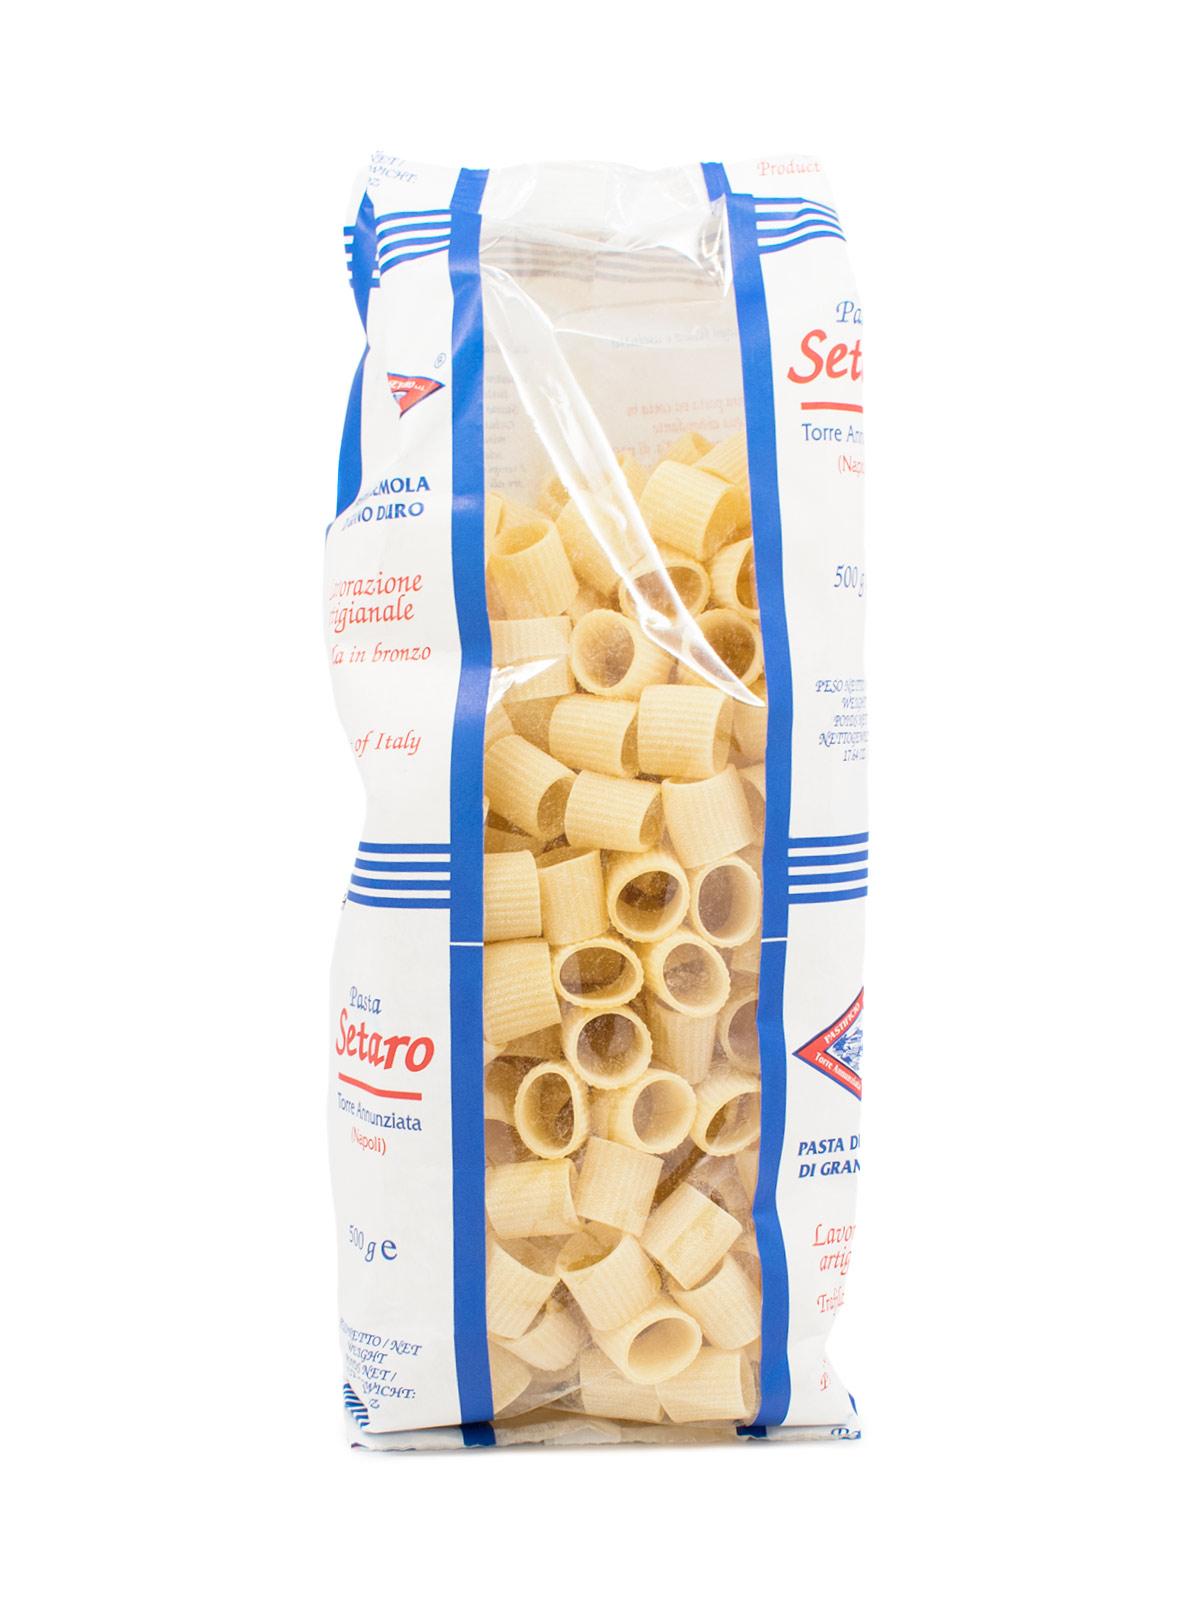 Mezze Millerighe - Pastas, Rice, and Grains - Buon'Italia